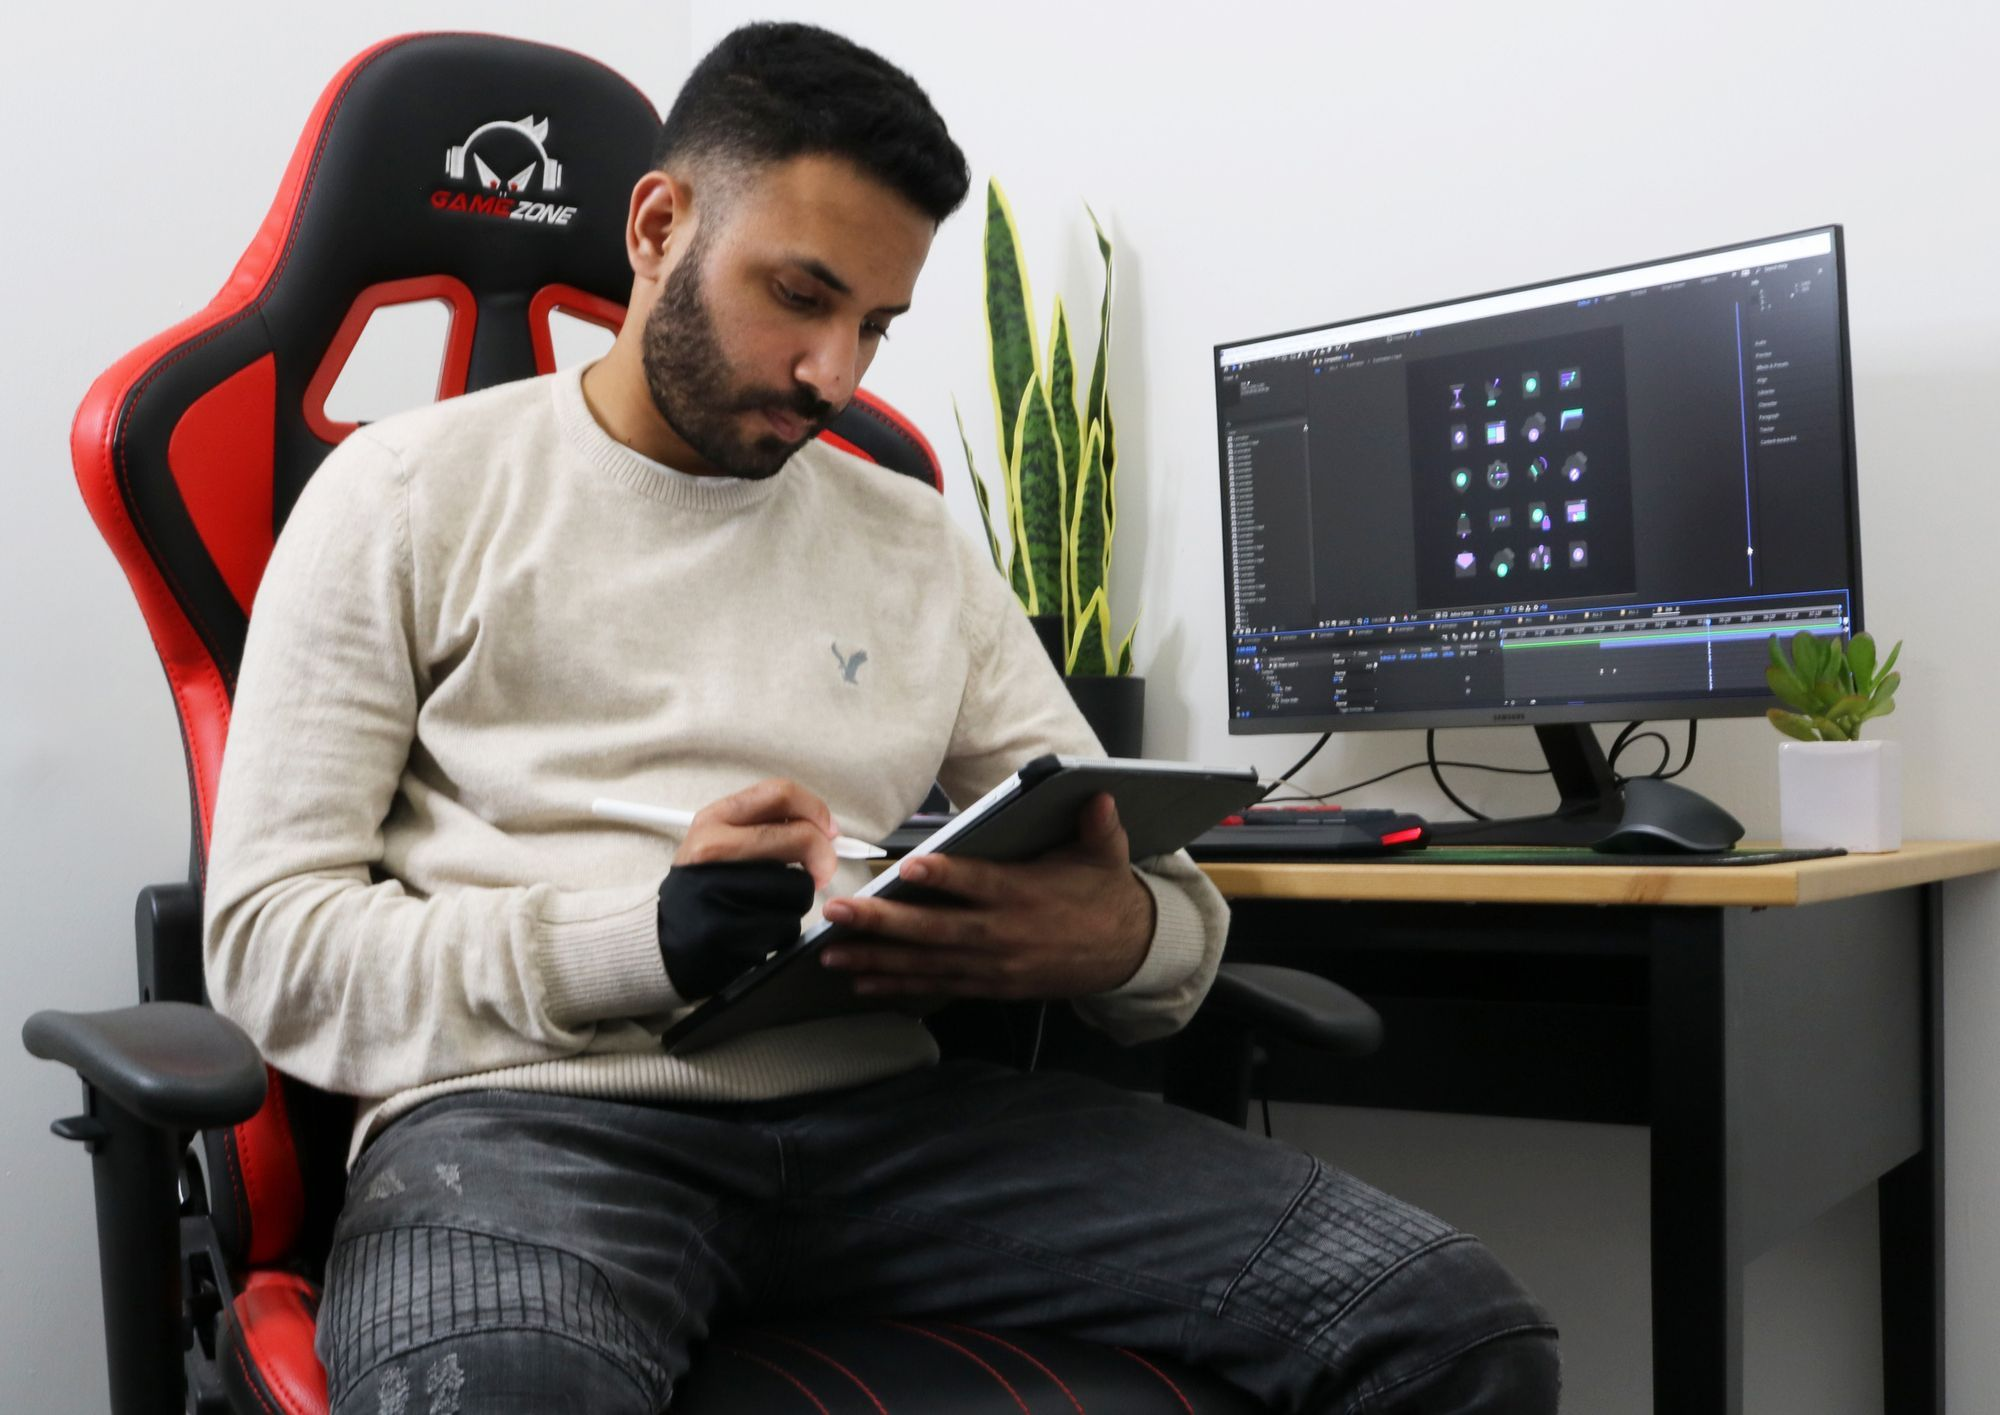 Eden is an Israeli Interactive UX/UI Designer and Illustrator